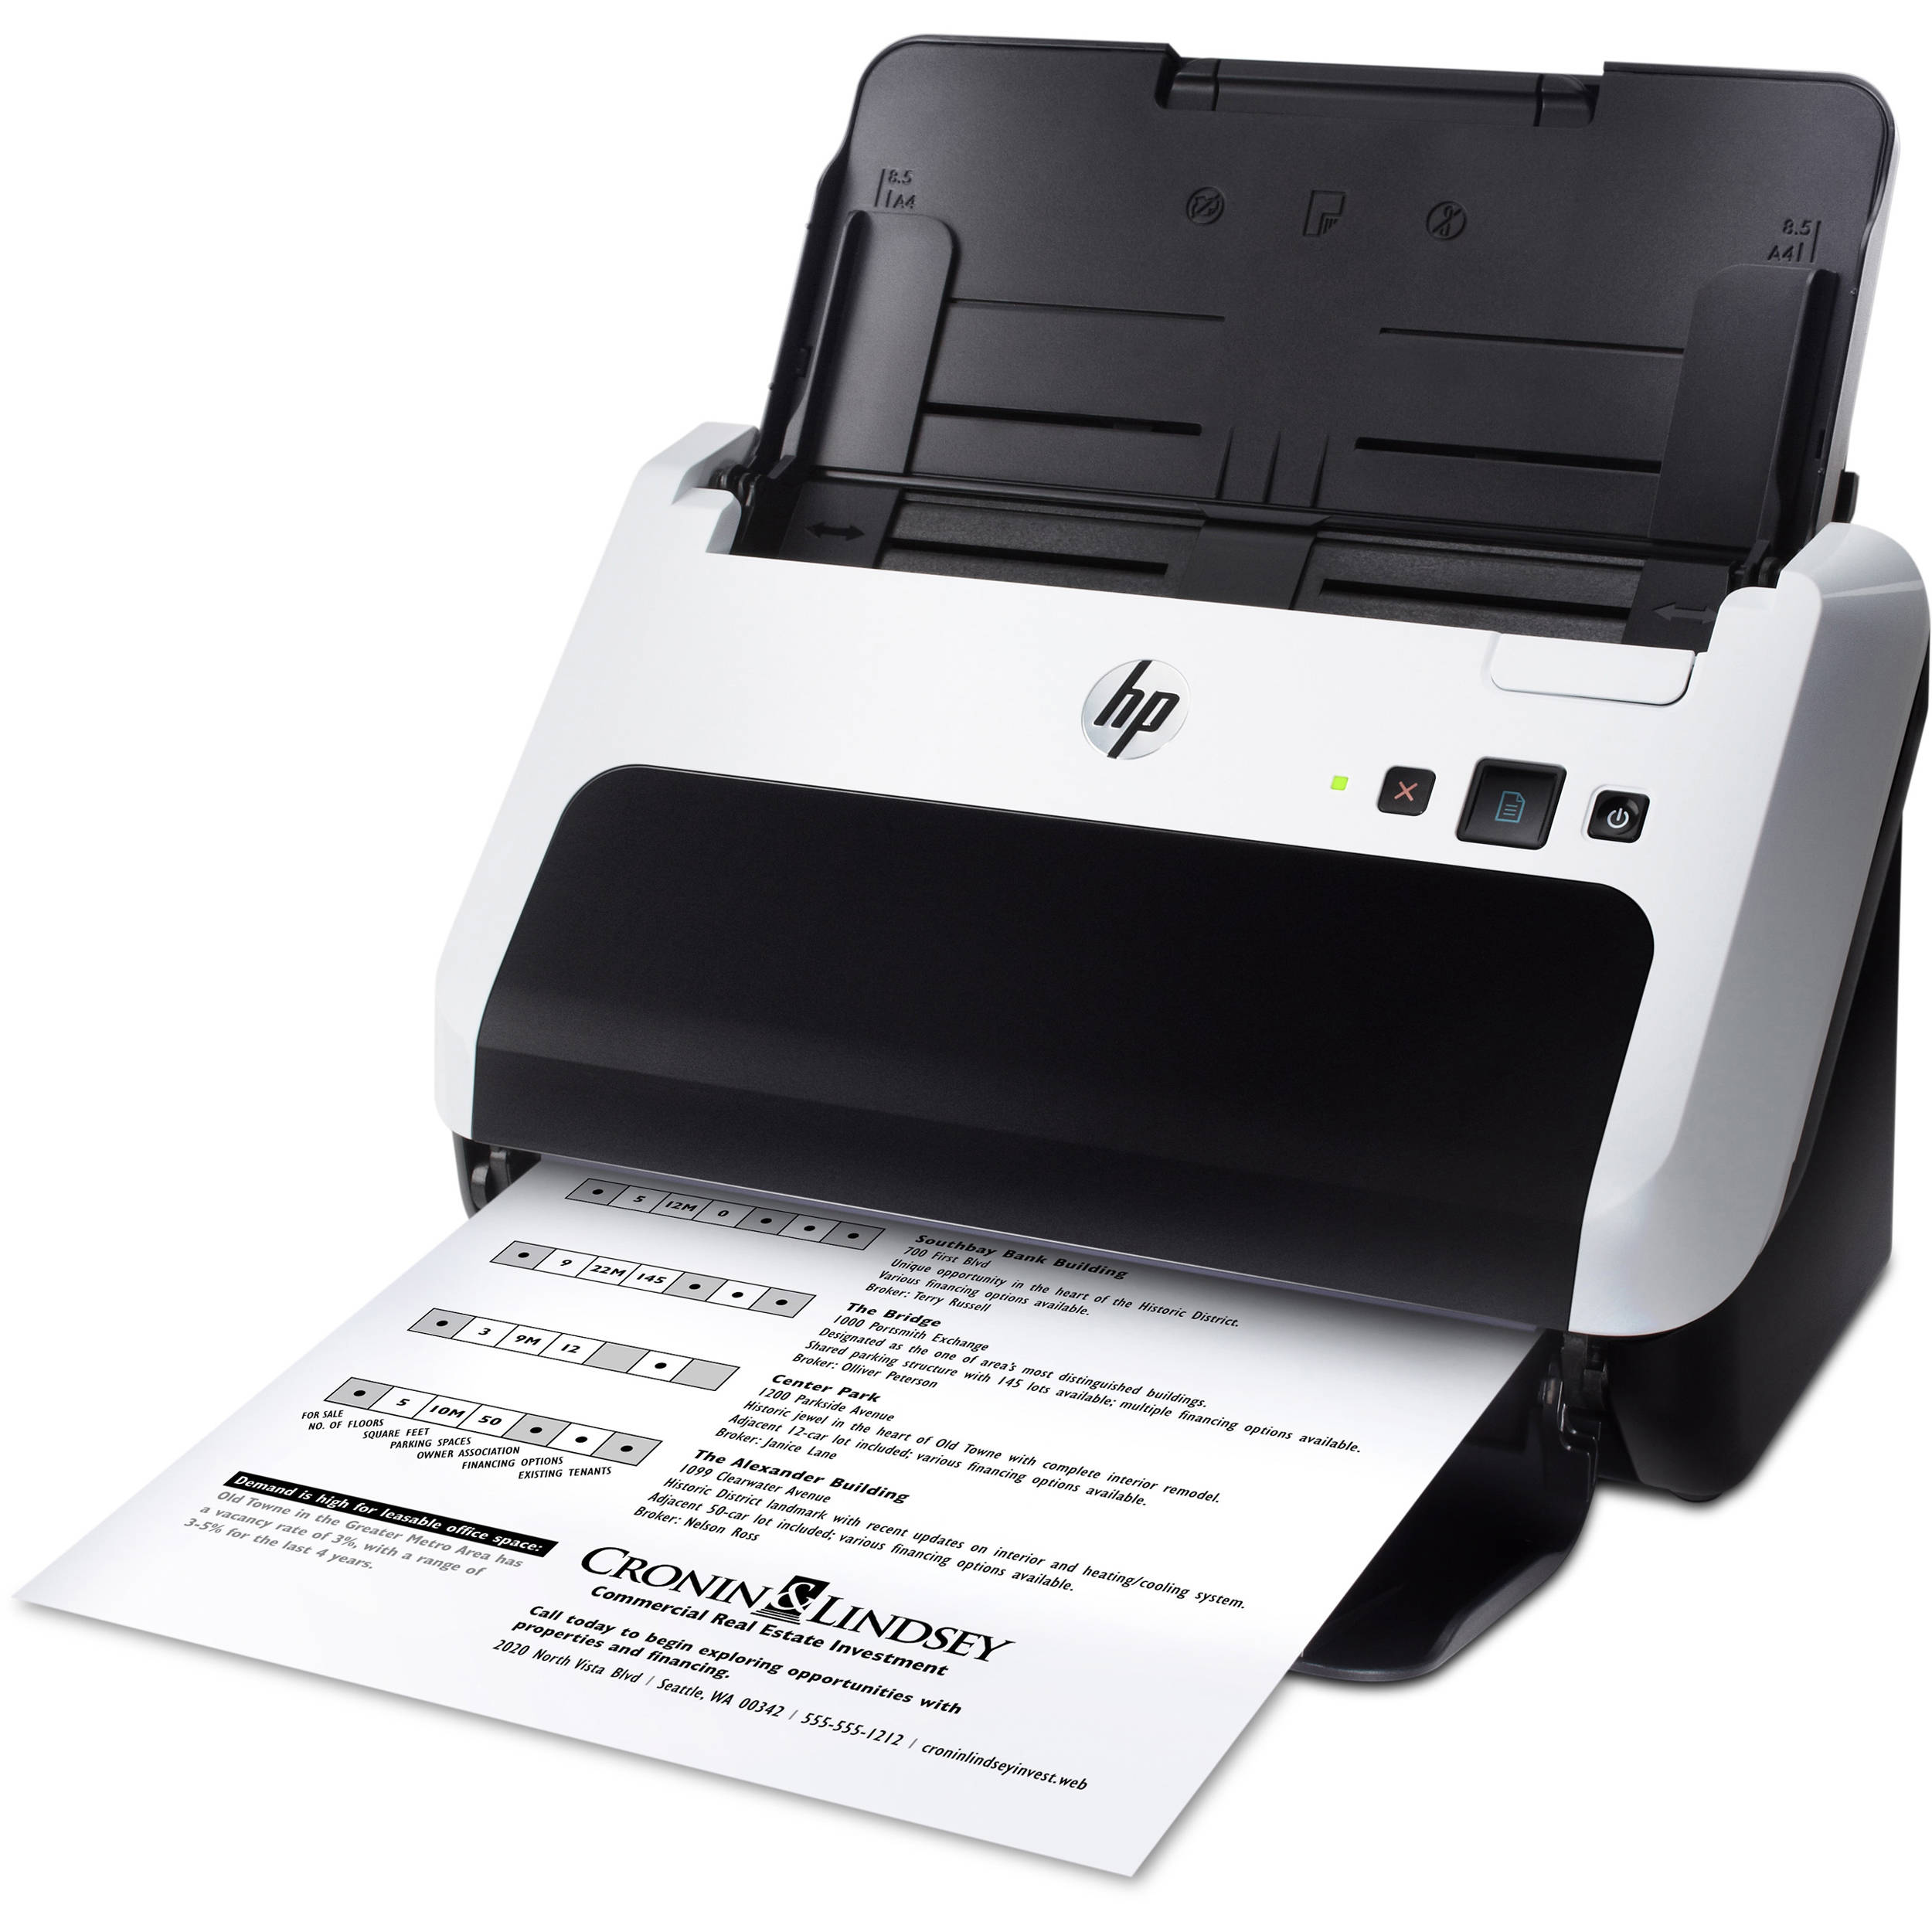 hp scanjet pro 3000 s2 sheet feed scanner l2737a bgj b h photo rh bhphotovideo com HP Scanjet 3000 Review HP Scanjet 3000 S2